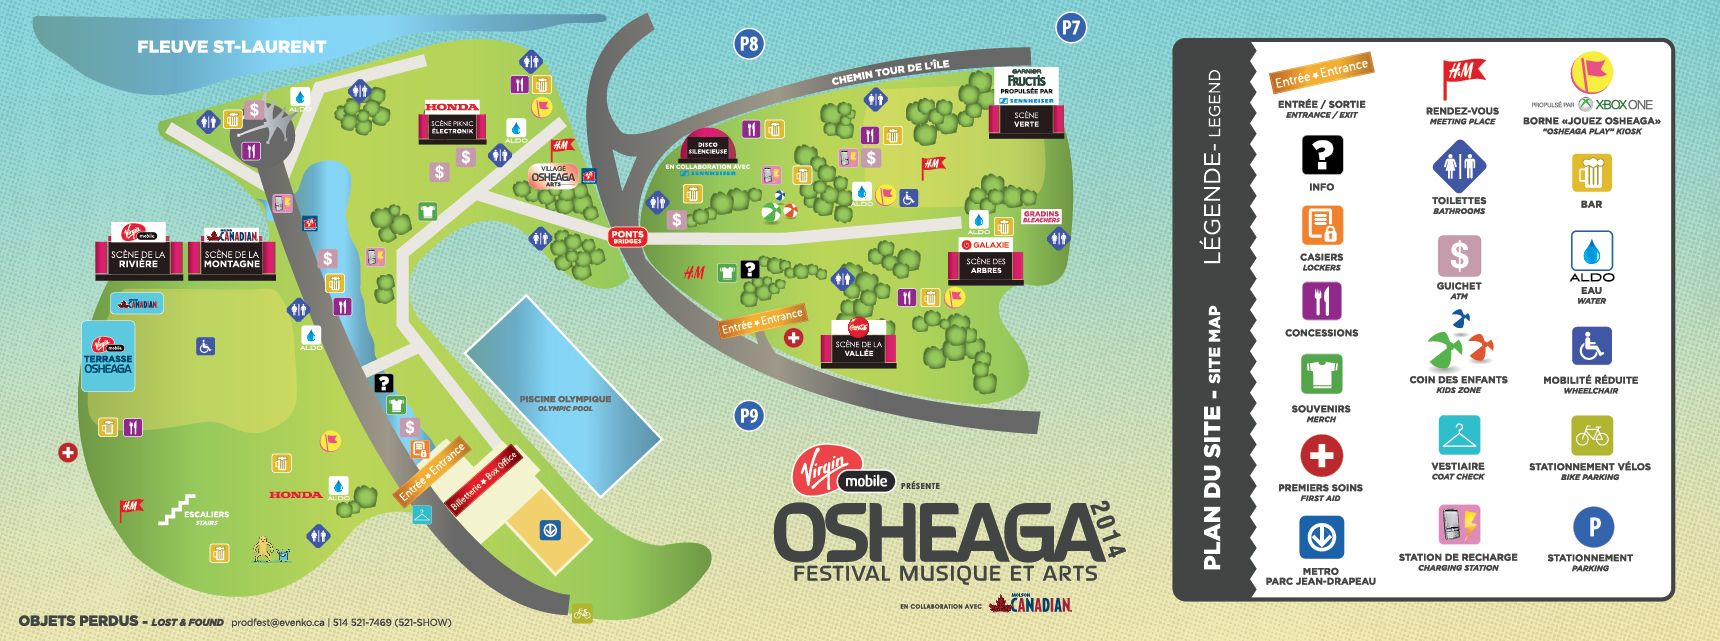 Osheaga_SiteMap1